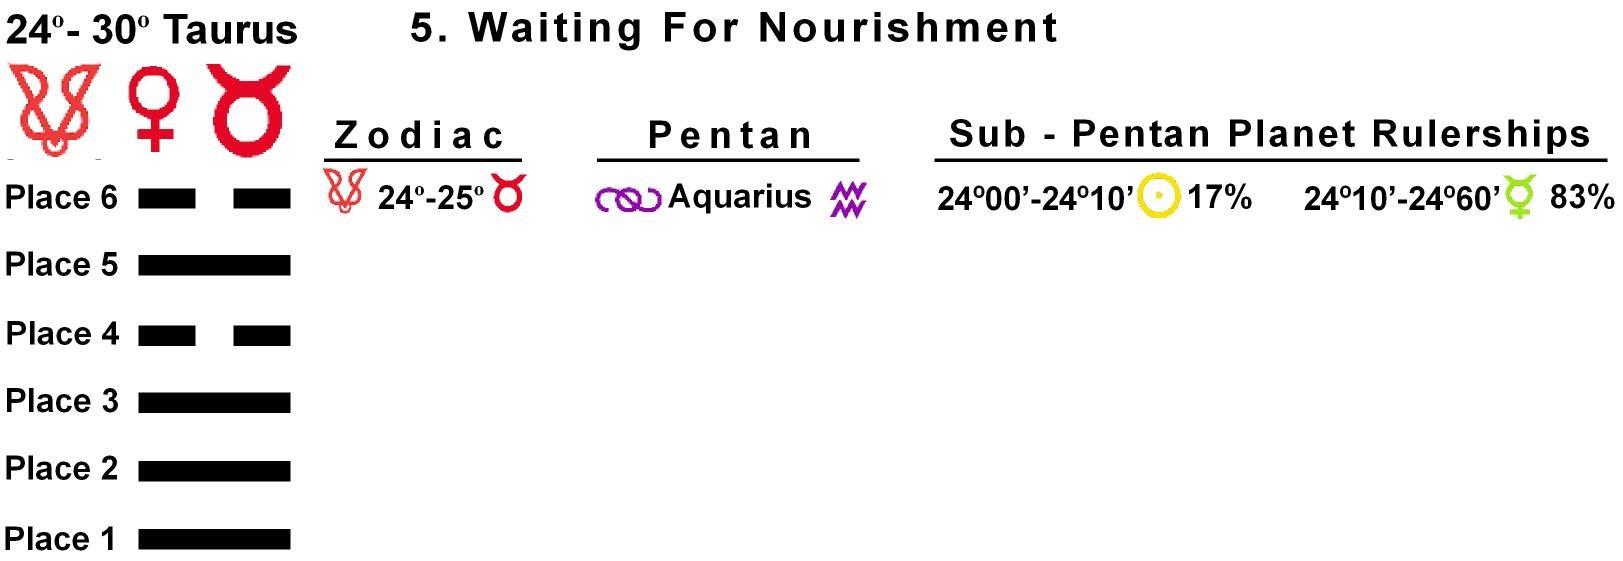 Pent-lines-02TA 24-25 Hx-05 Waiting For Nourishment